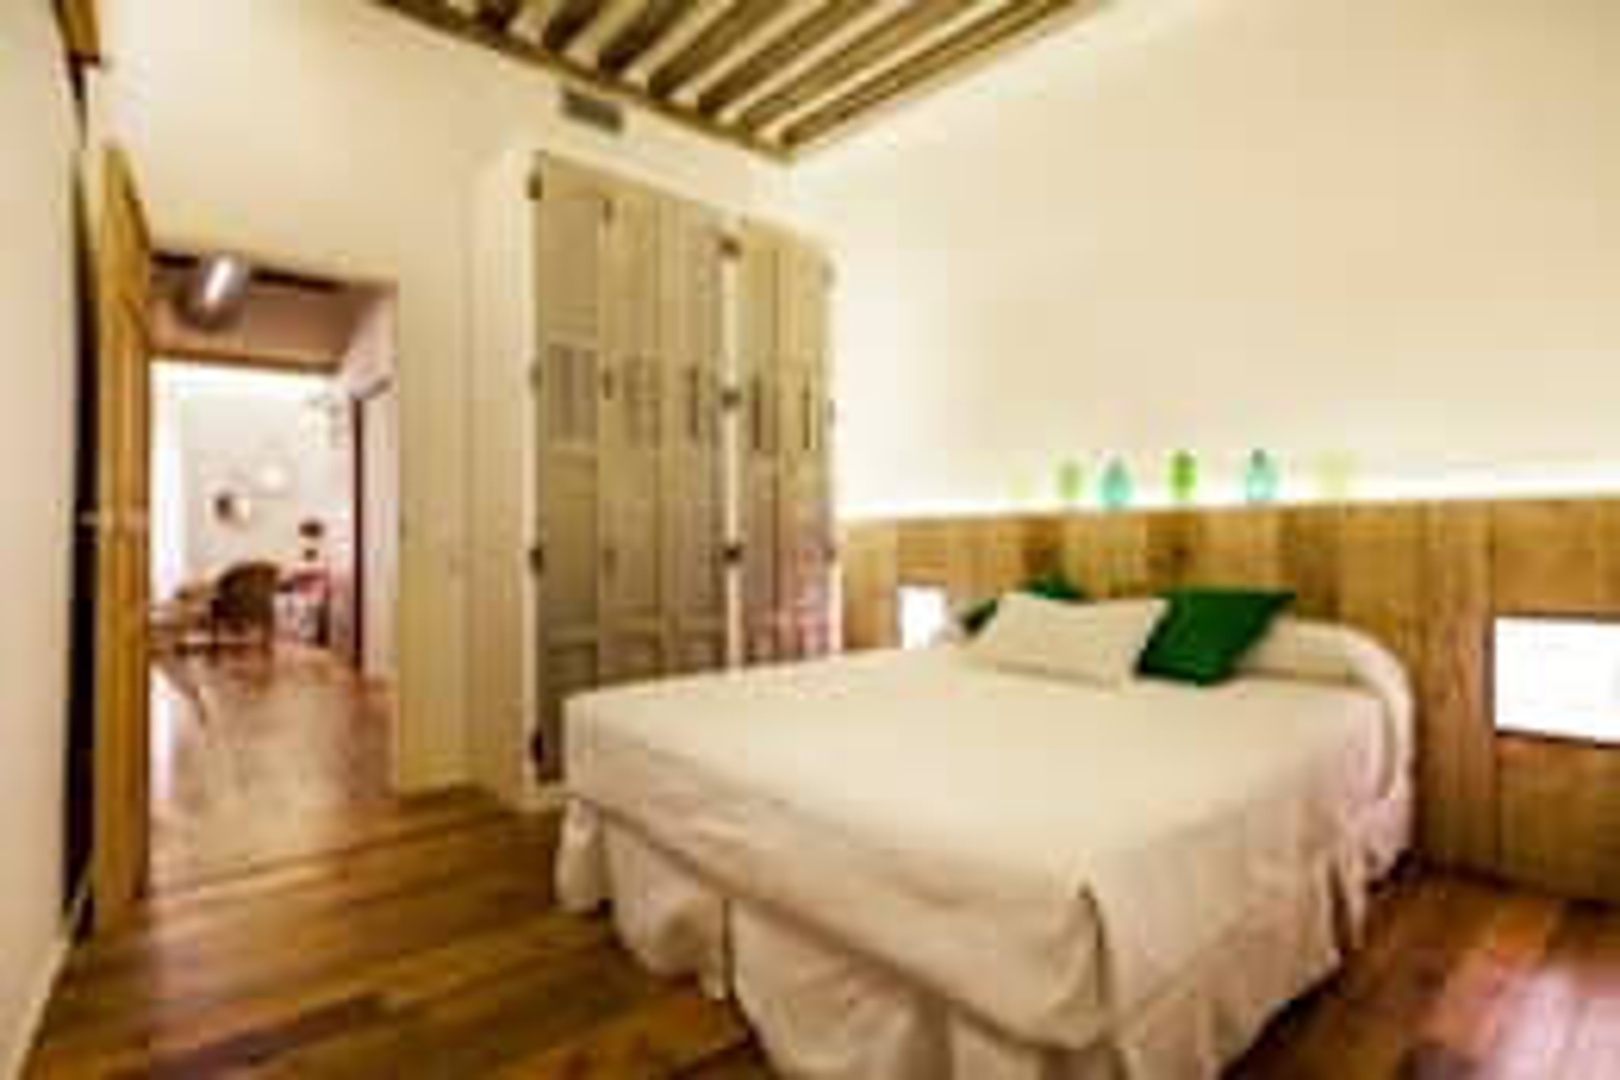 10 Dormitorios rsticos sper modernos Con miles de ideas para